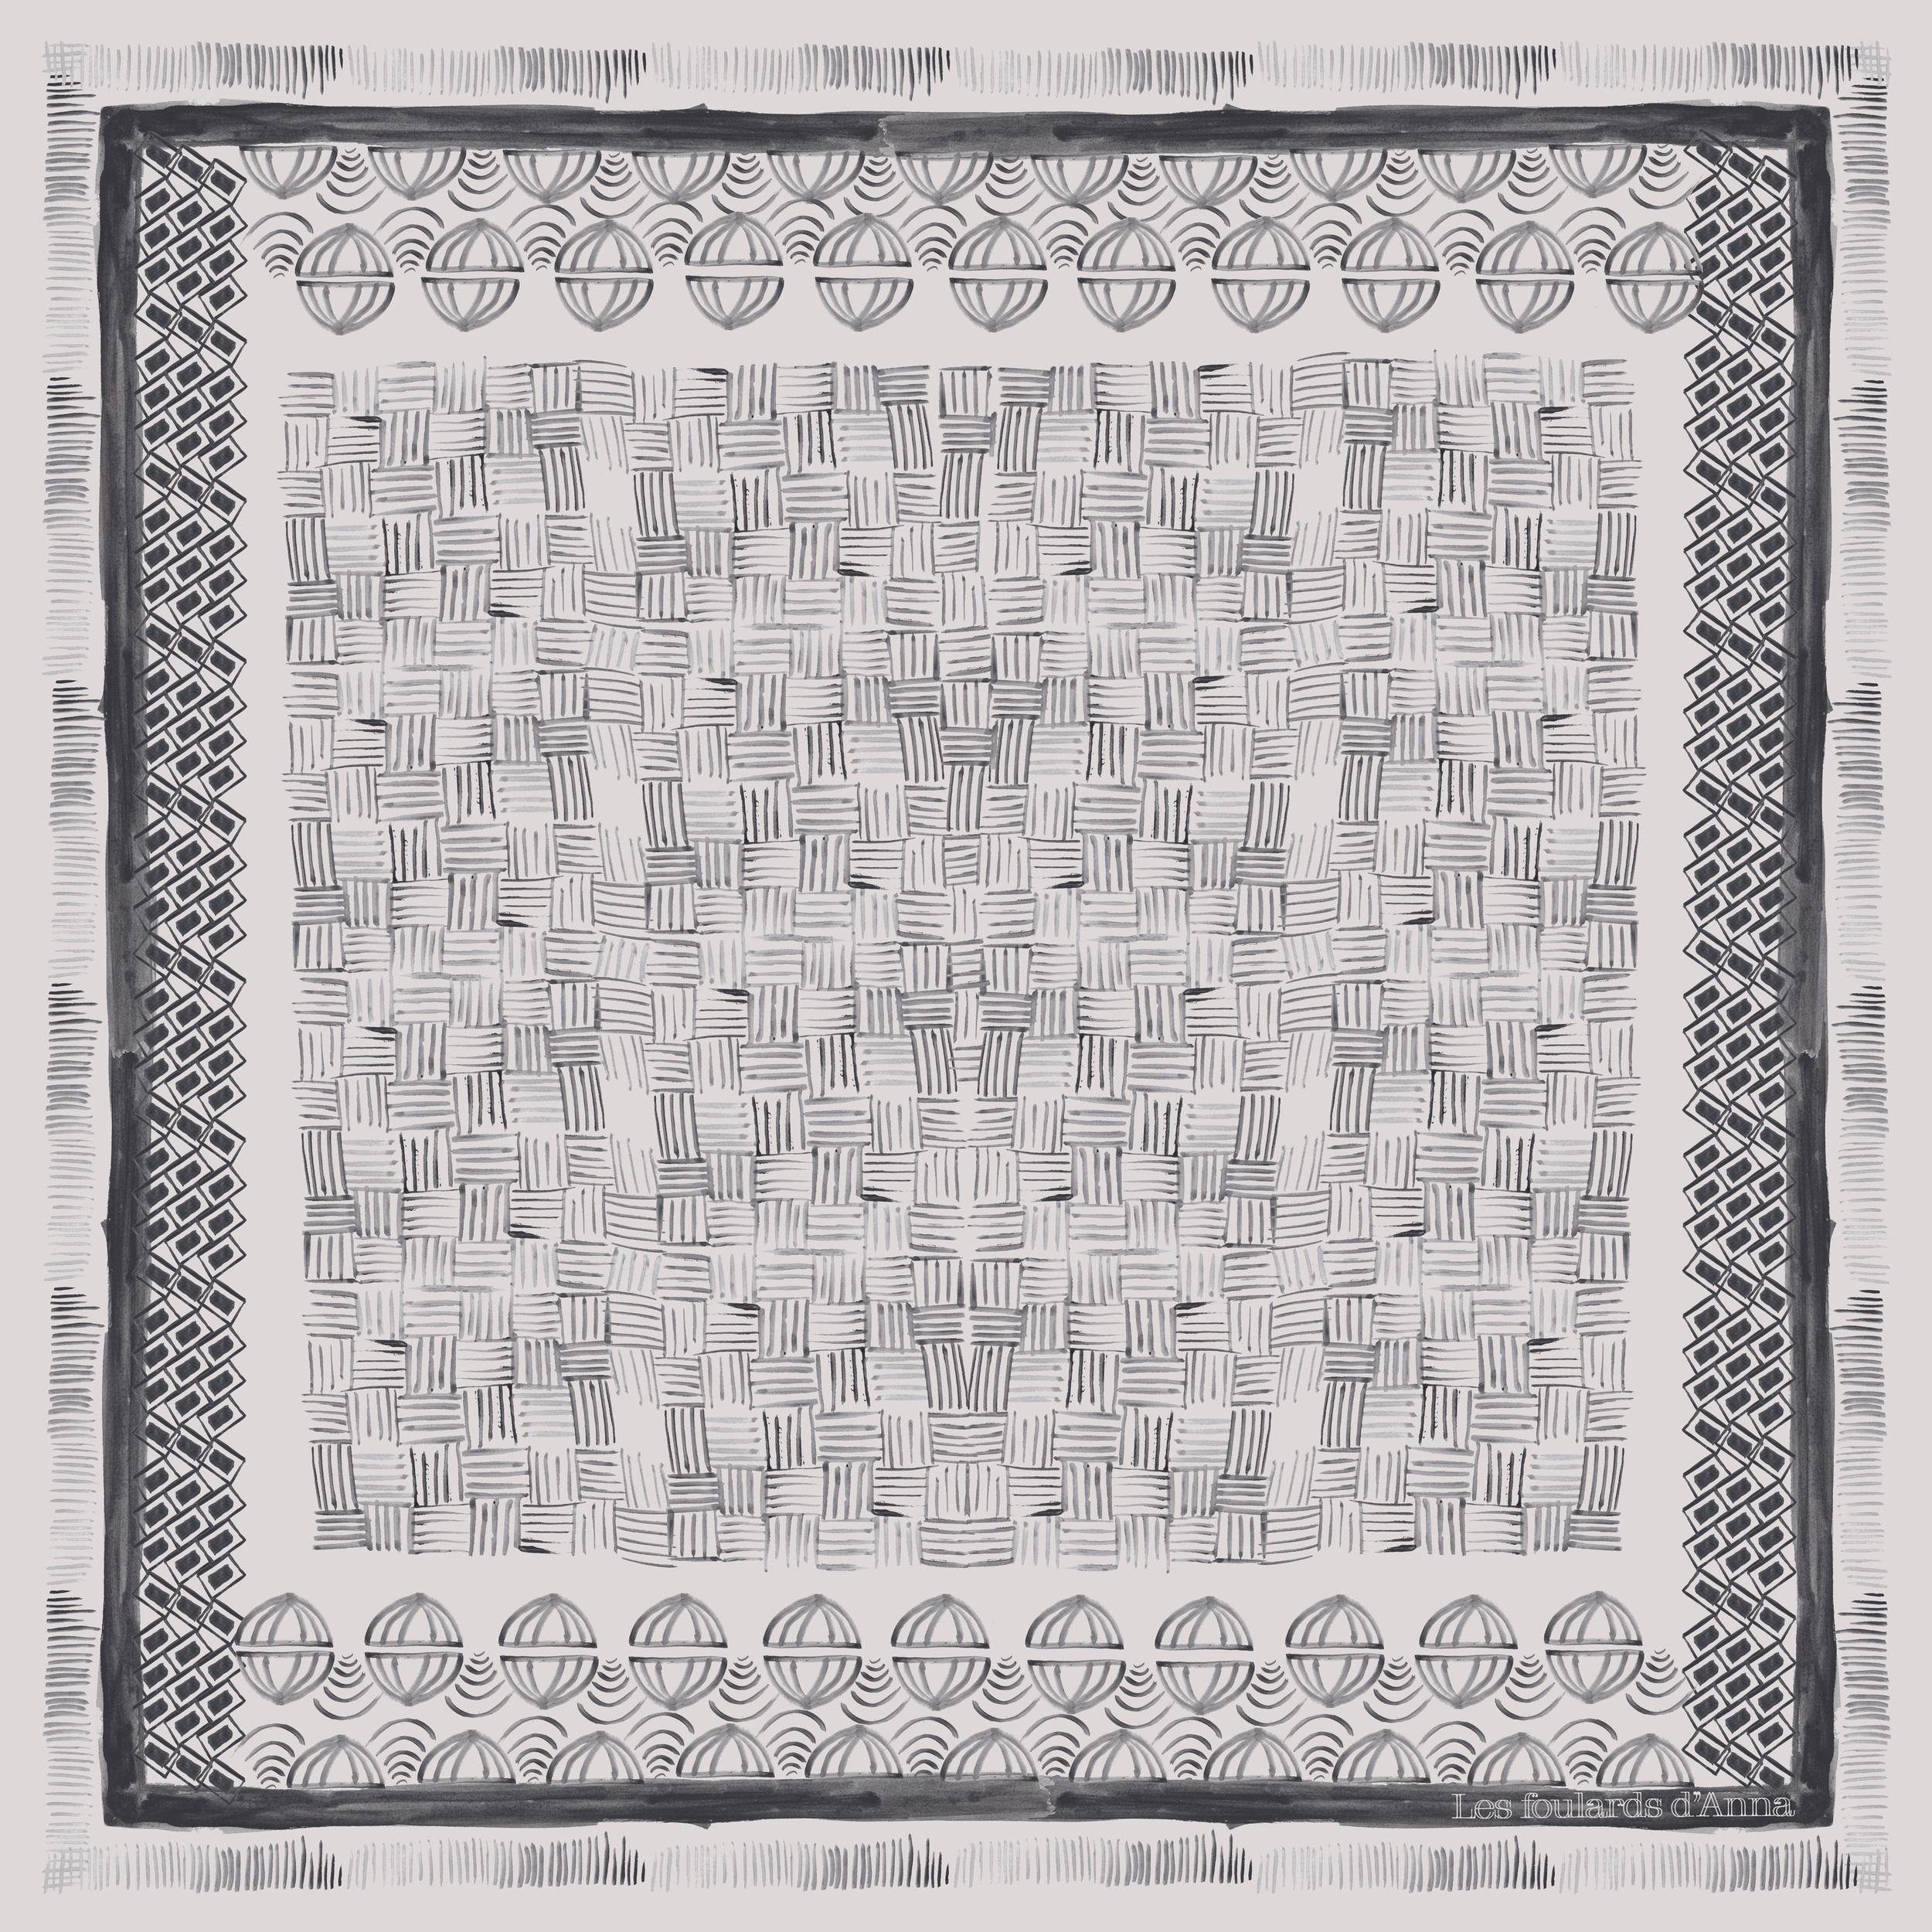 "Foulard "" Isia "". 90X90cm  100% twill de soie  Fabrication française  Série limitée ."